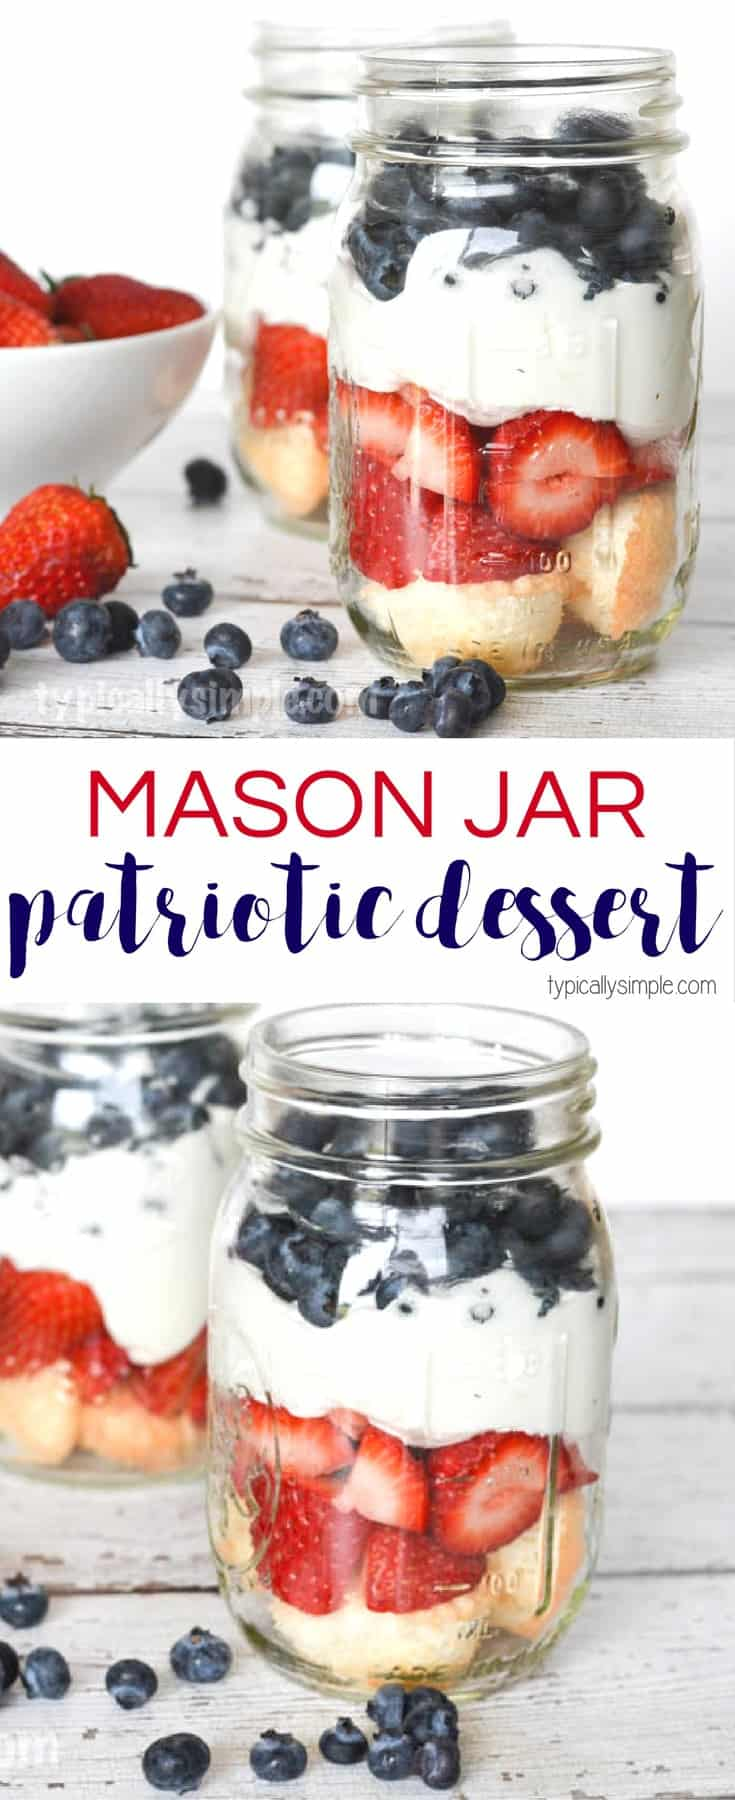 Patriotic red, white and blue mason jar dessert